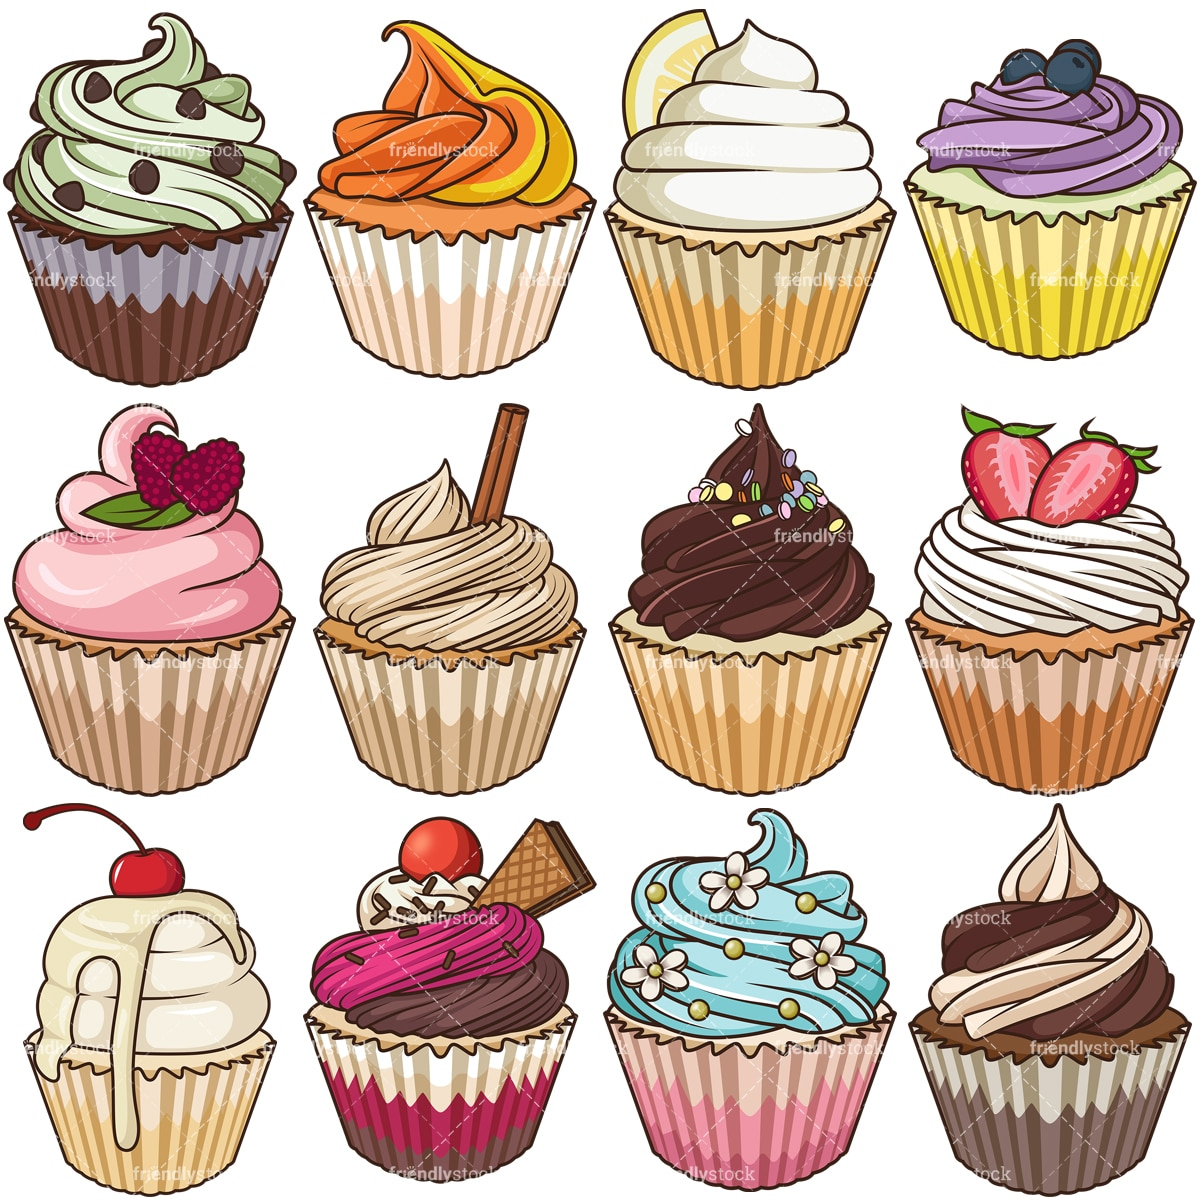 Delicious Cupcakes Cartoon Vector Clipart - FriendlyStock